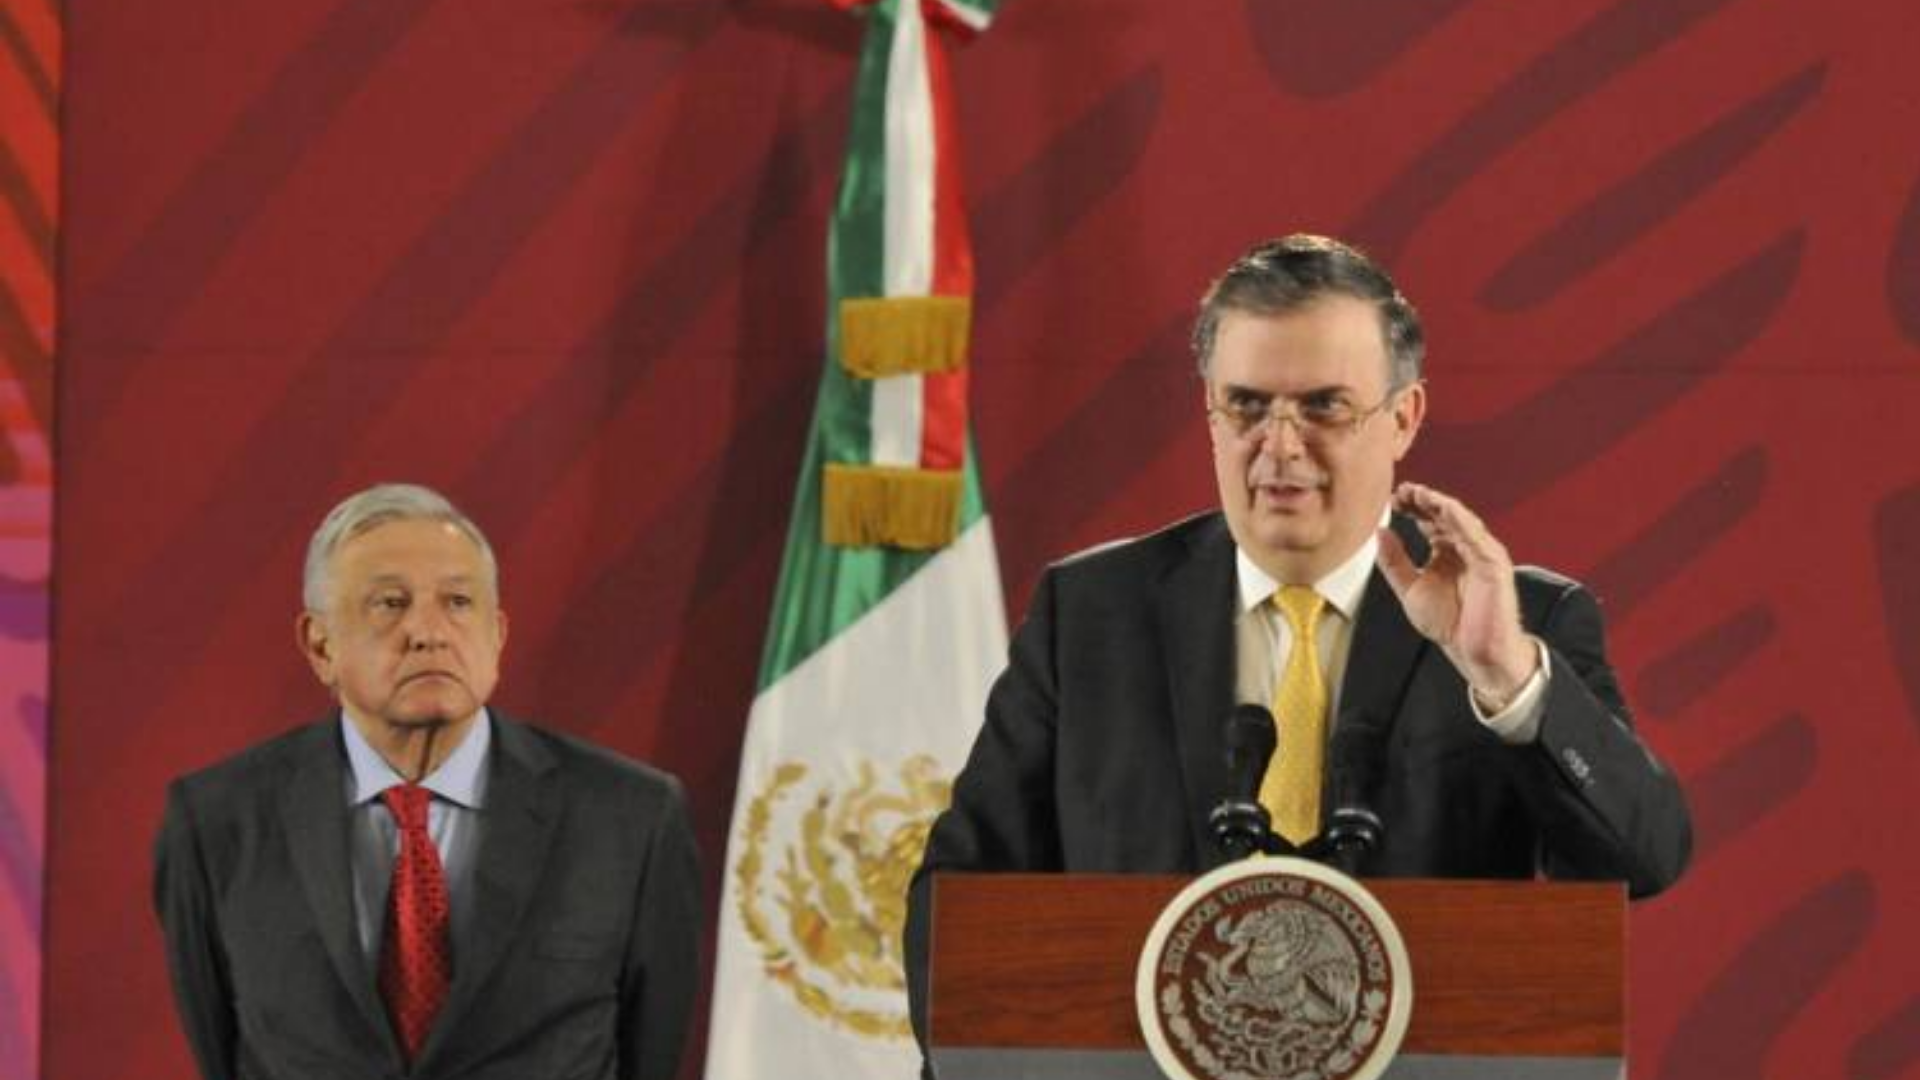 Evo Morales llegará a México aproximadamente a las 11:00 horas: Ebrard